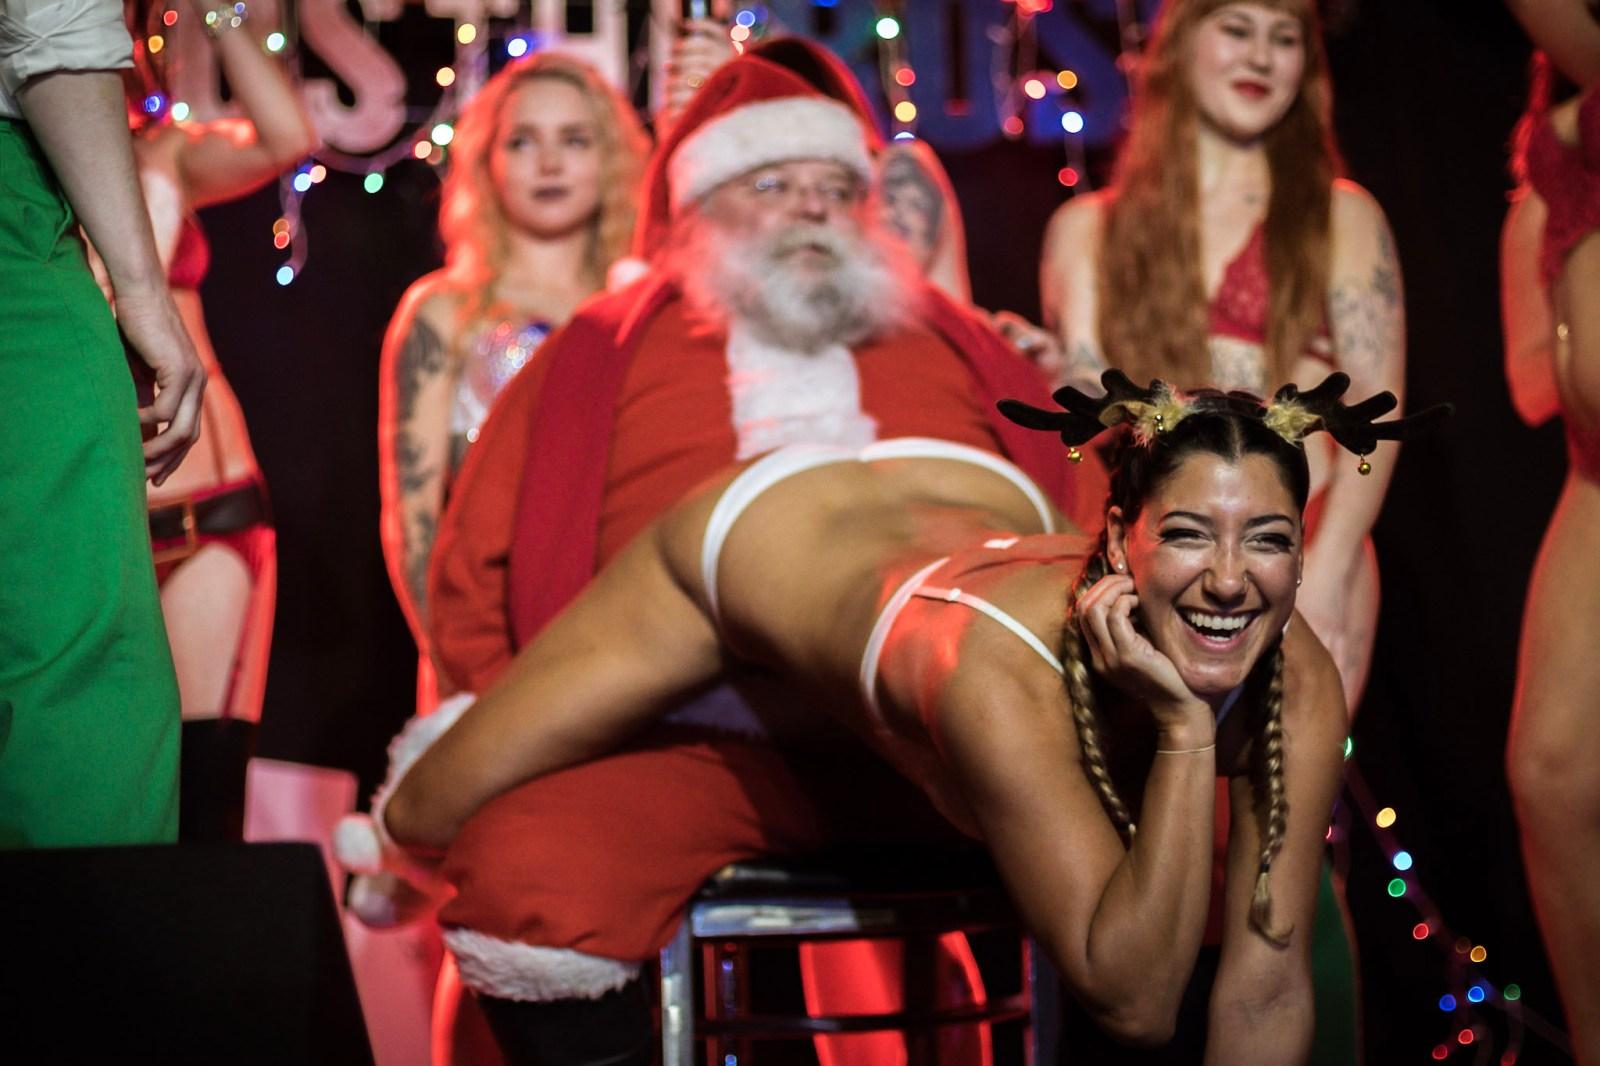 Tatas for Toys Portland PDX Dancer Stripper Santa Xmas Sexy